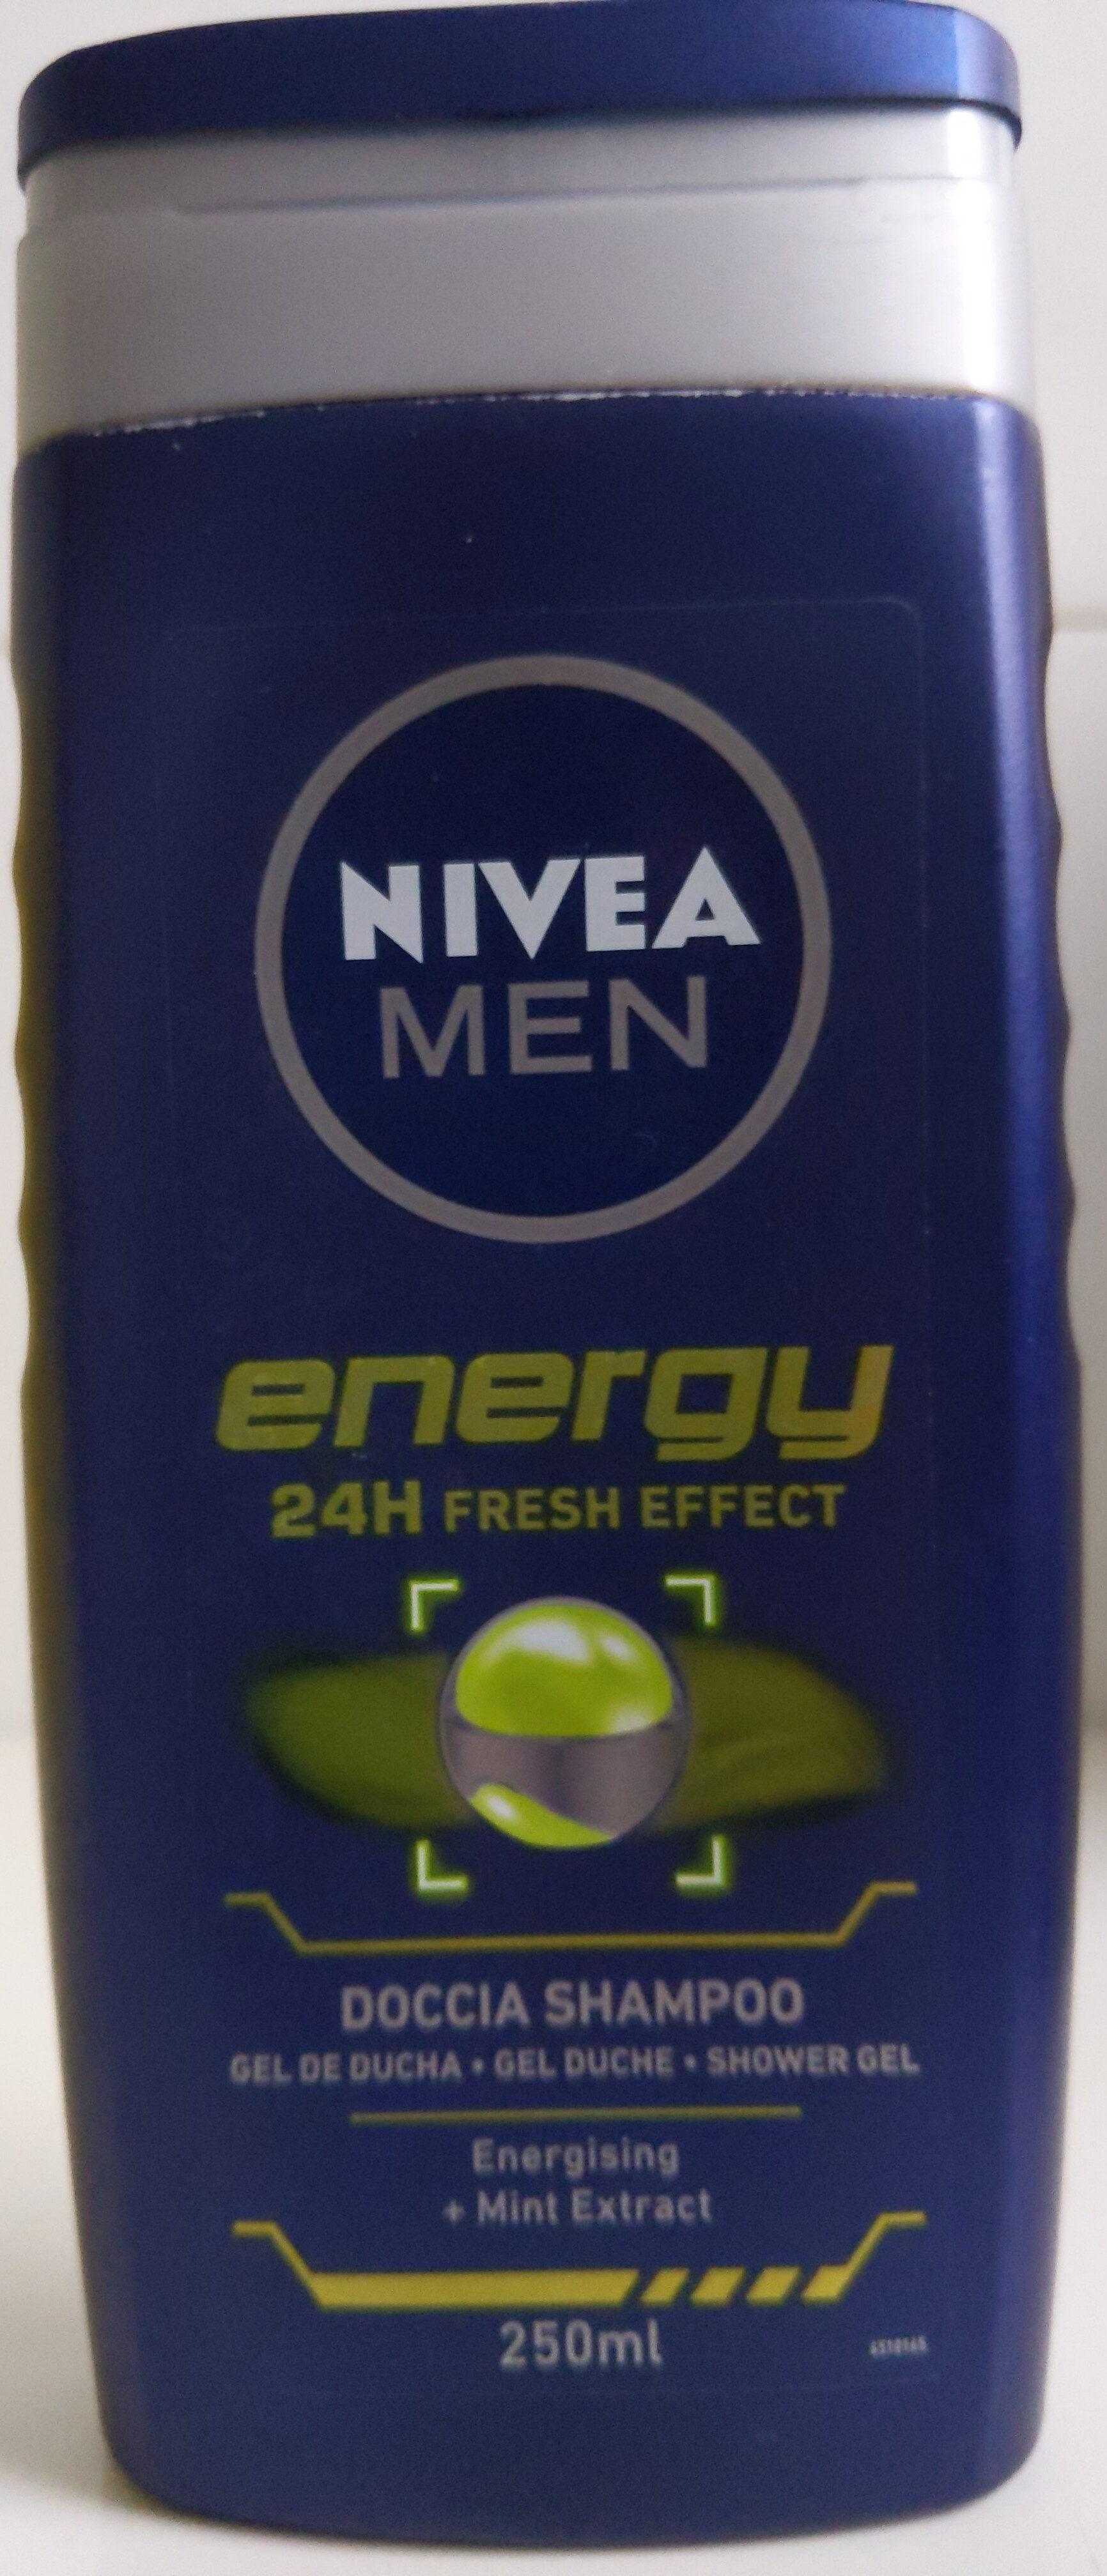 Nivea for men doccia gel energy - Produit - it